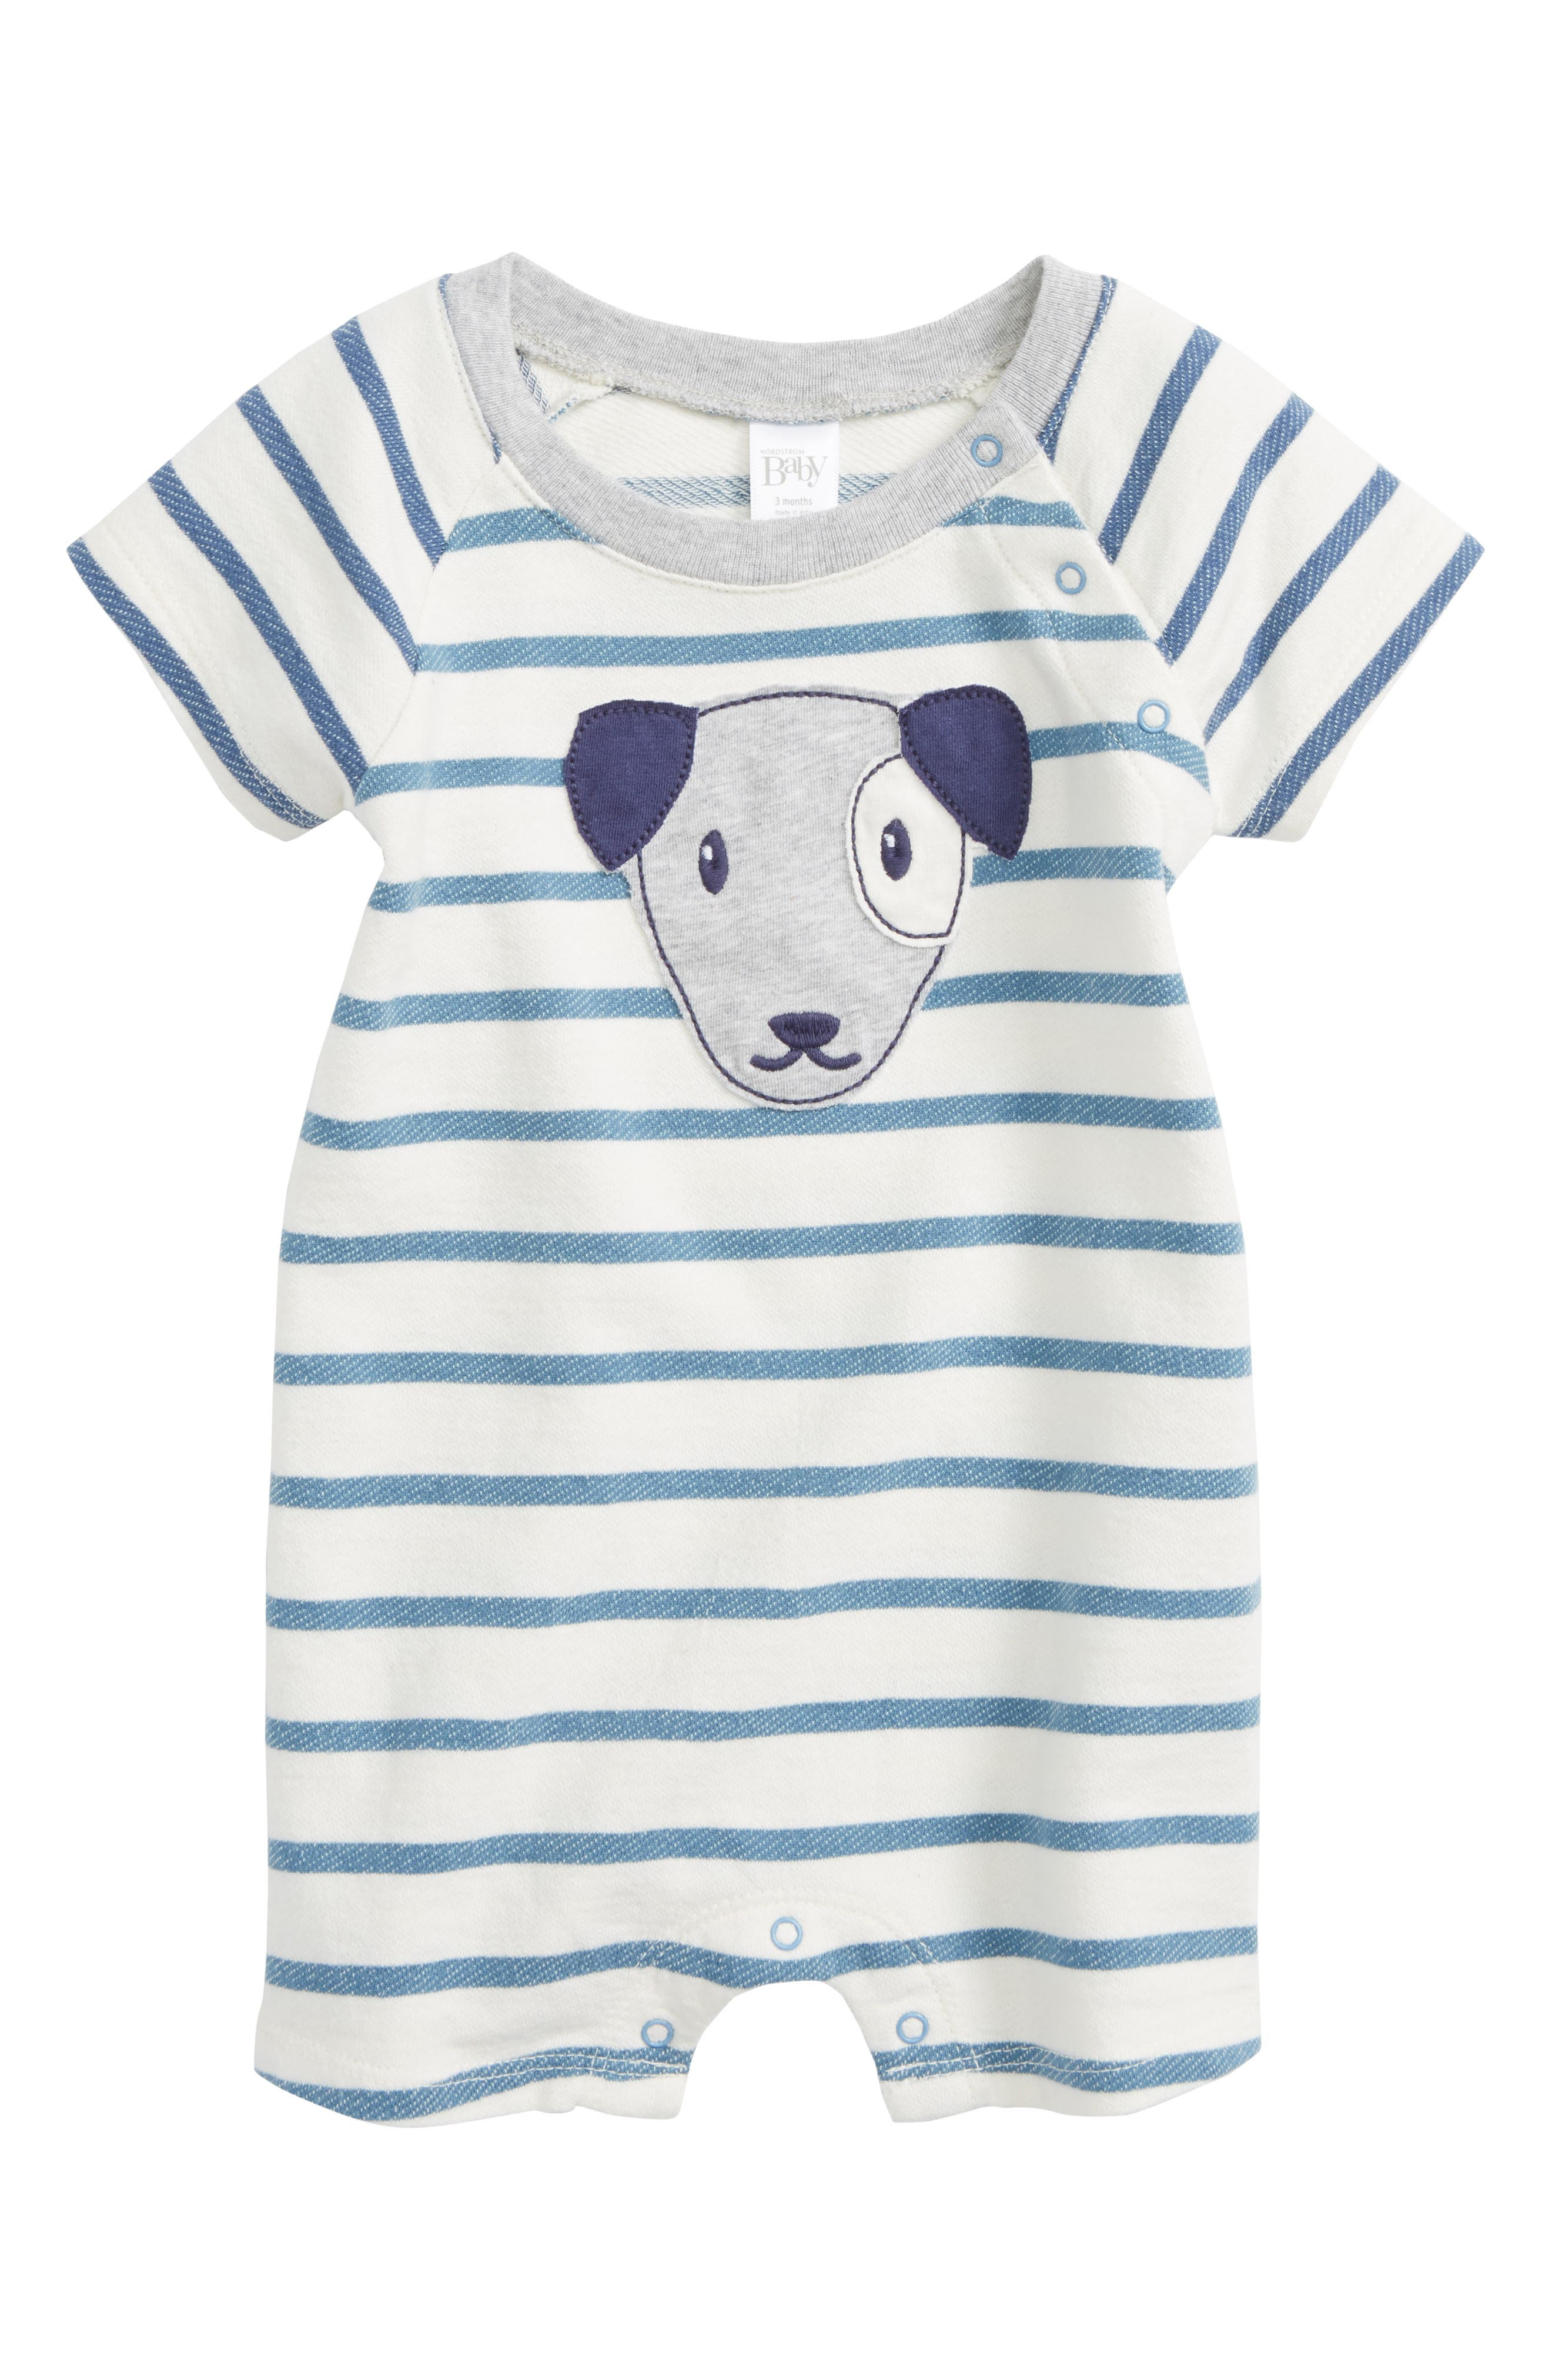 Nordstrom Baby Dog Appliqué Stripe Romper (Baby Boys)